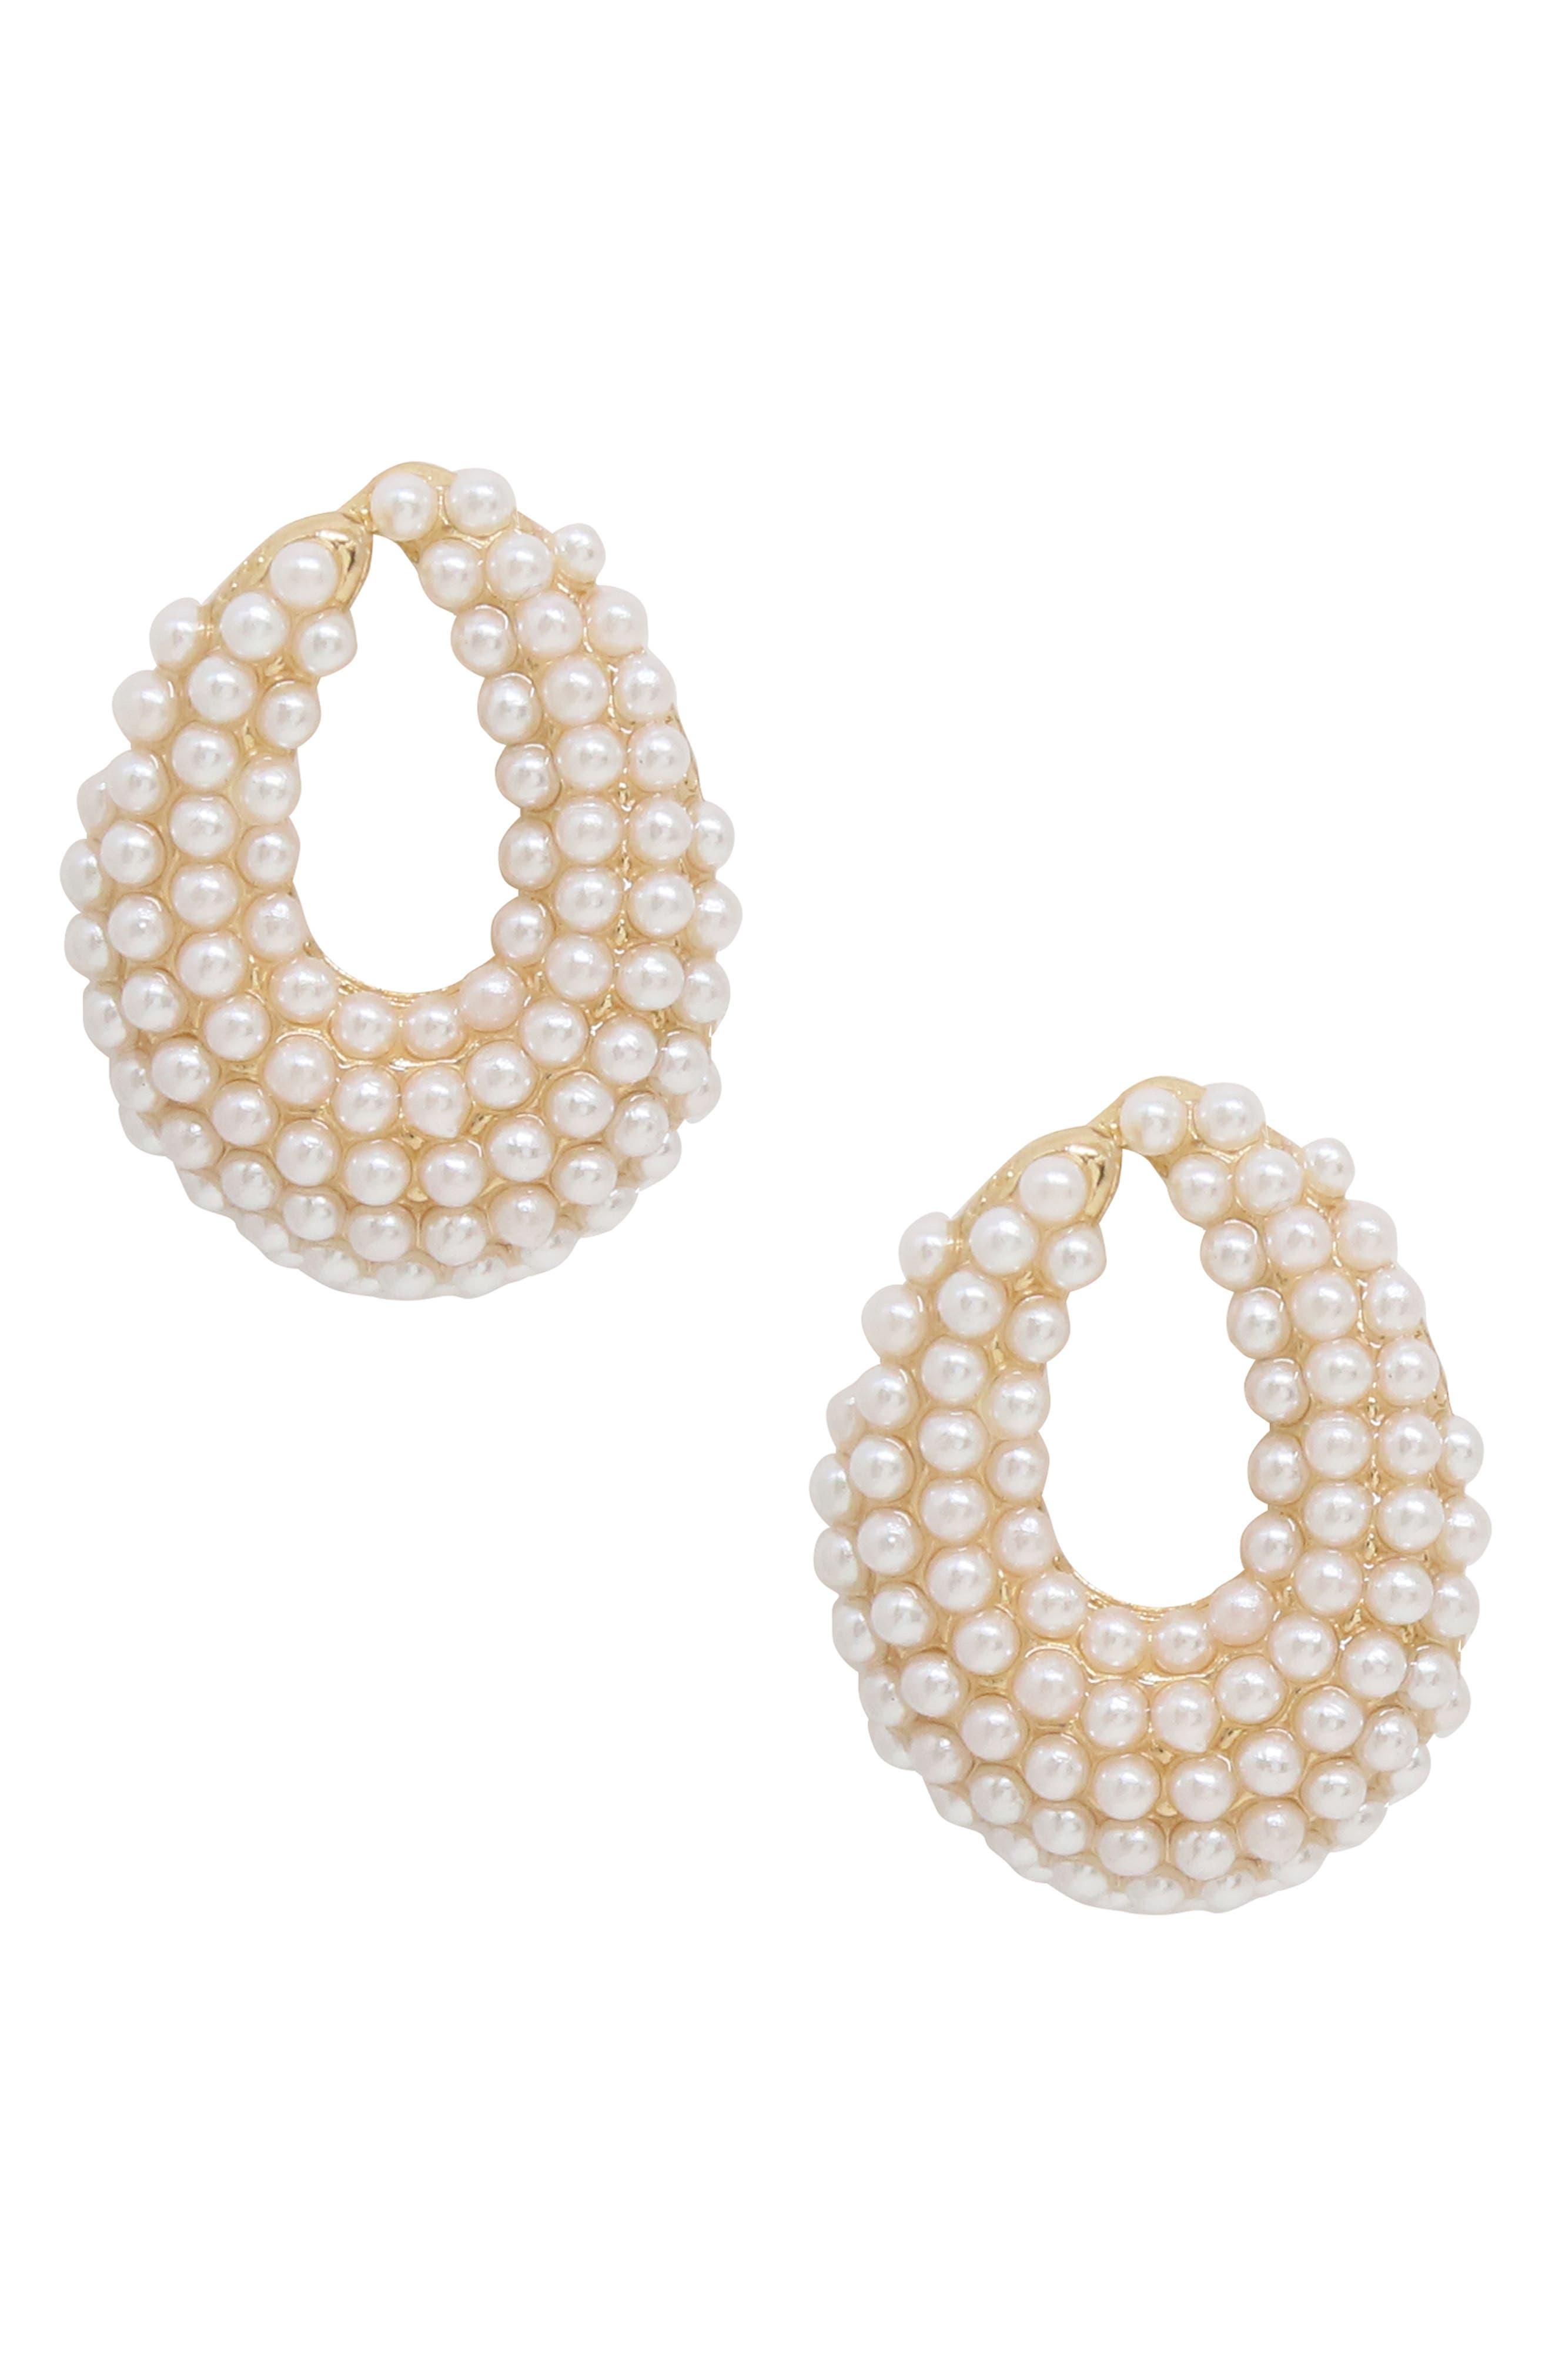 Imitation Pearl Earrings